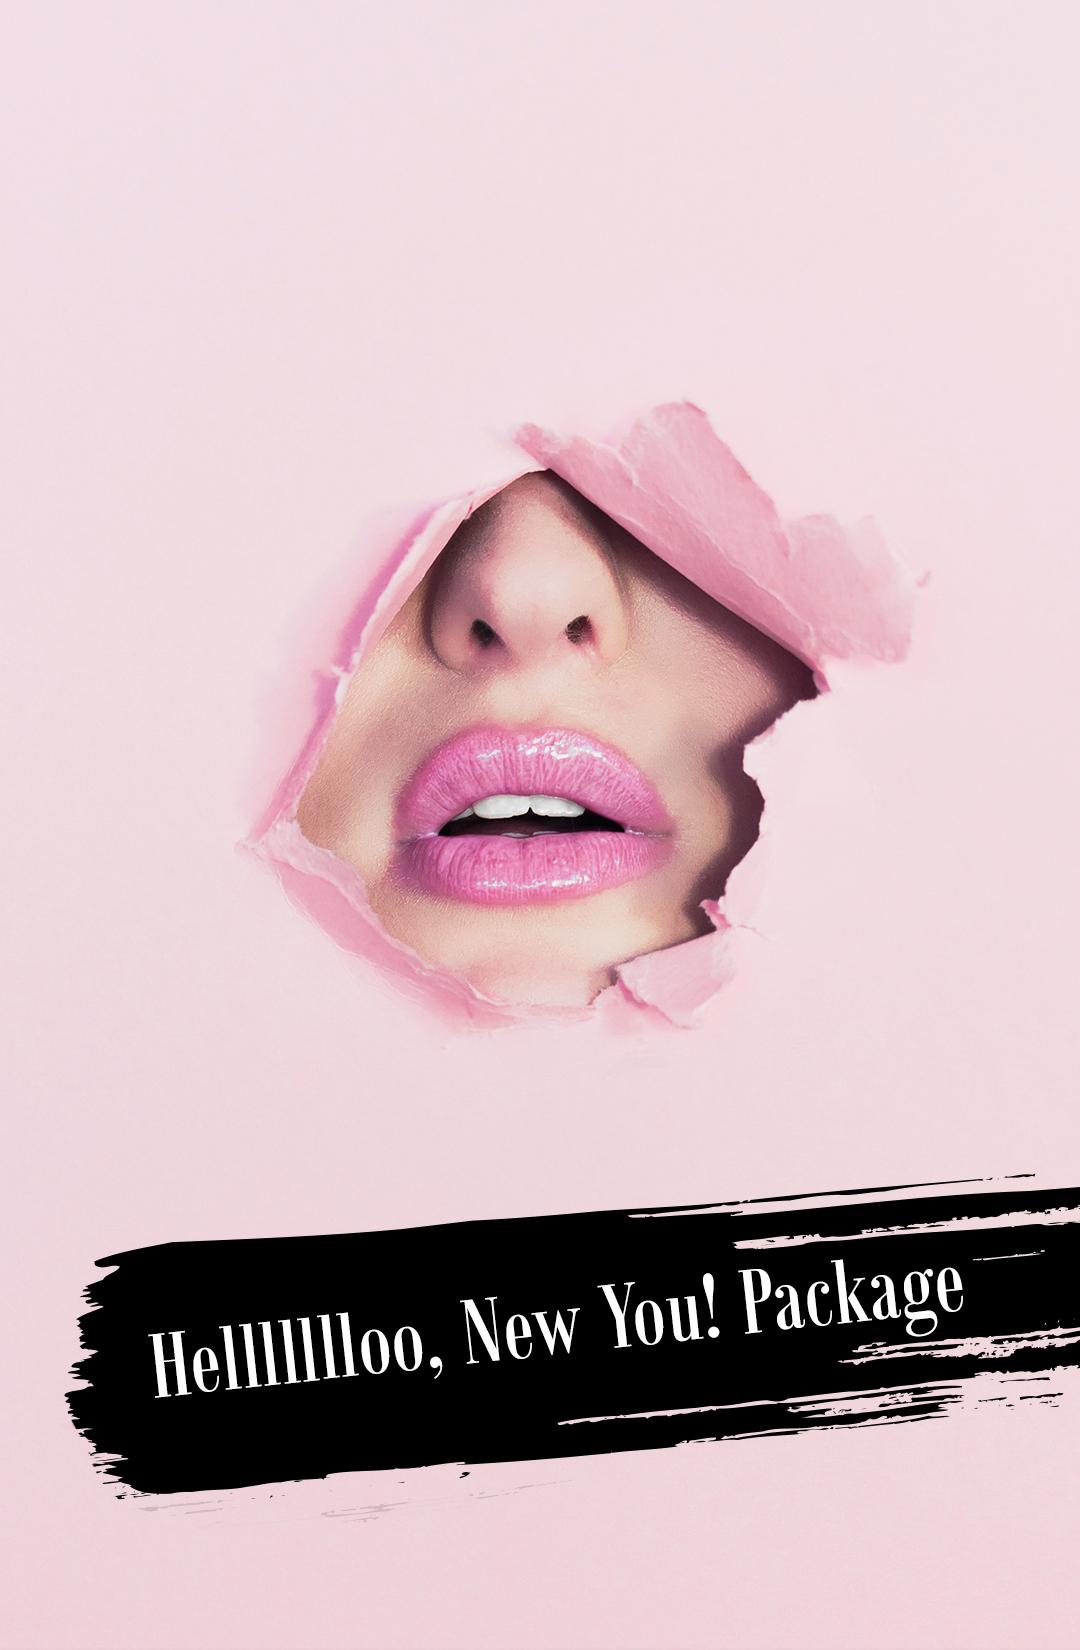 Hellllllloo, New You! Package.jpg